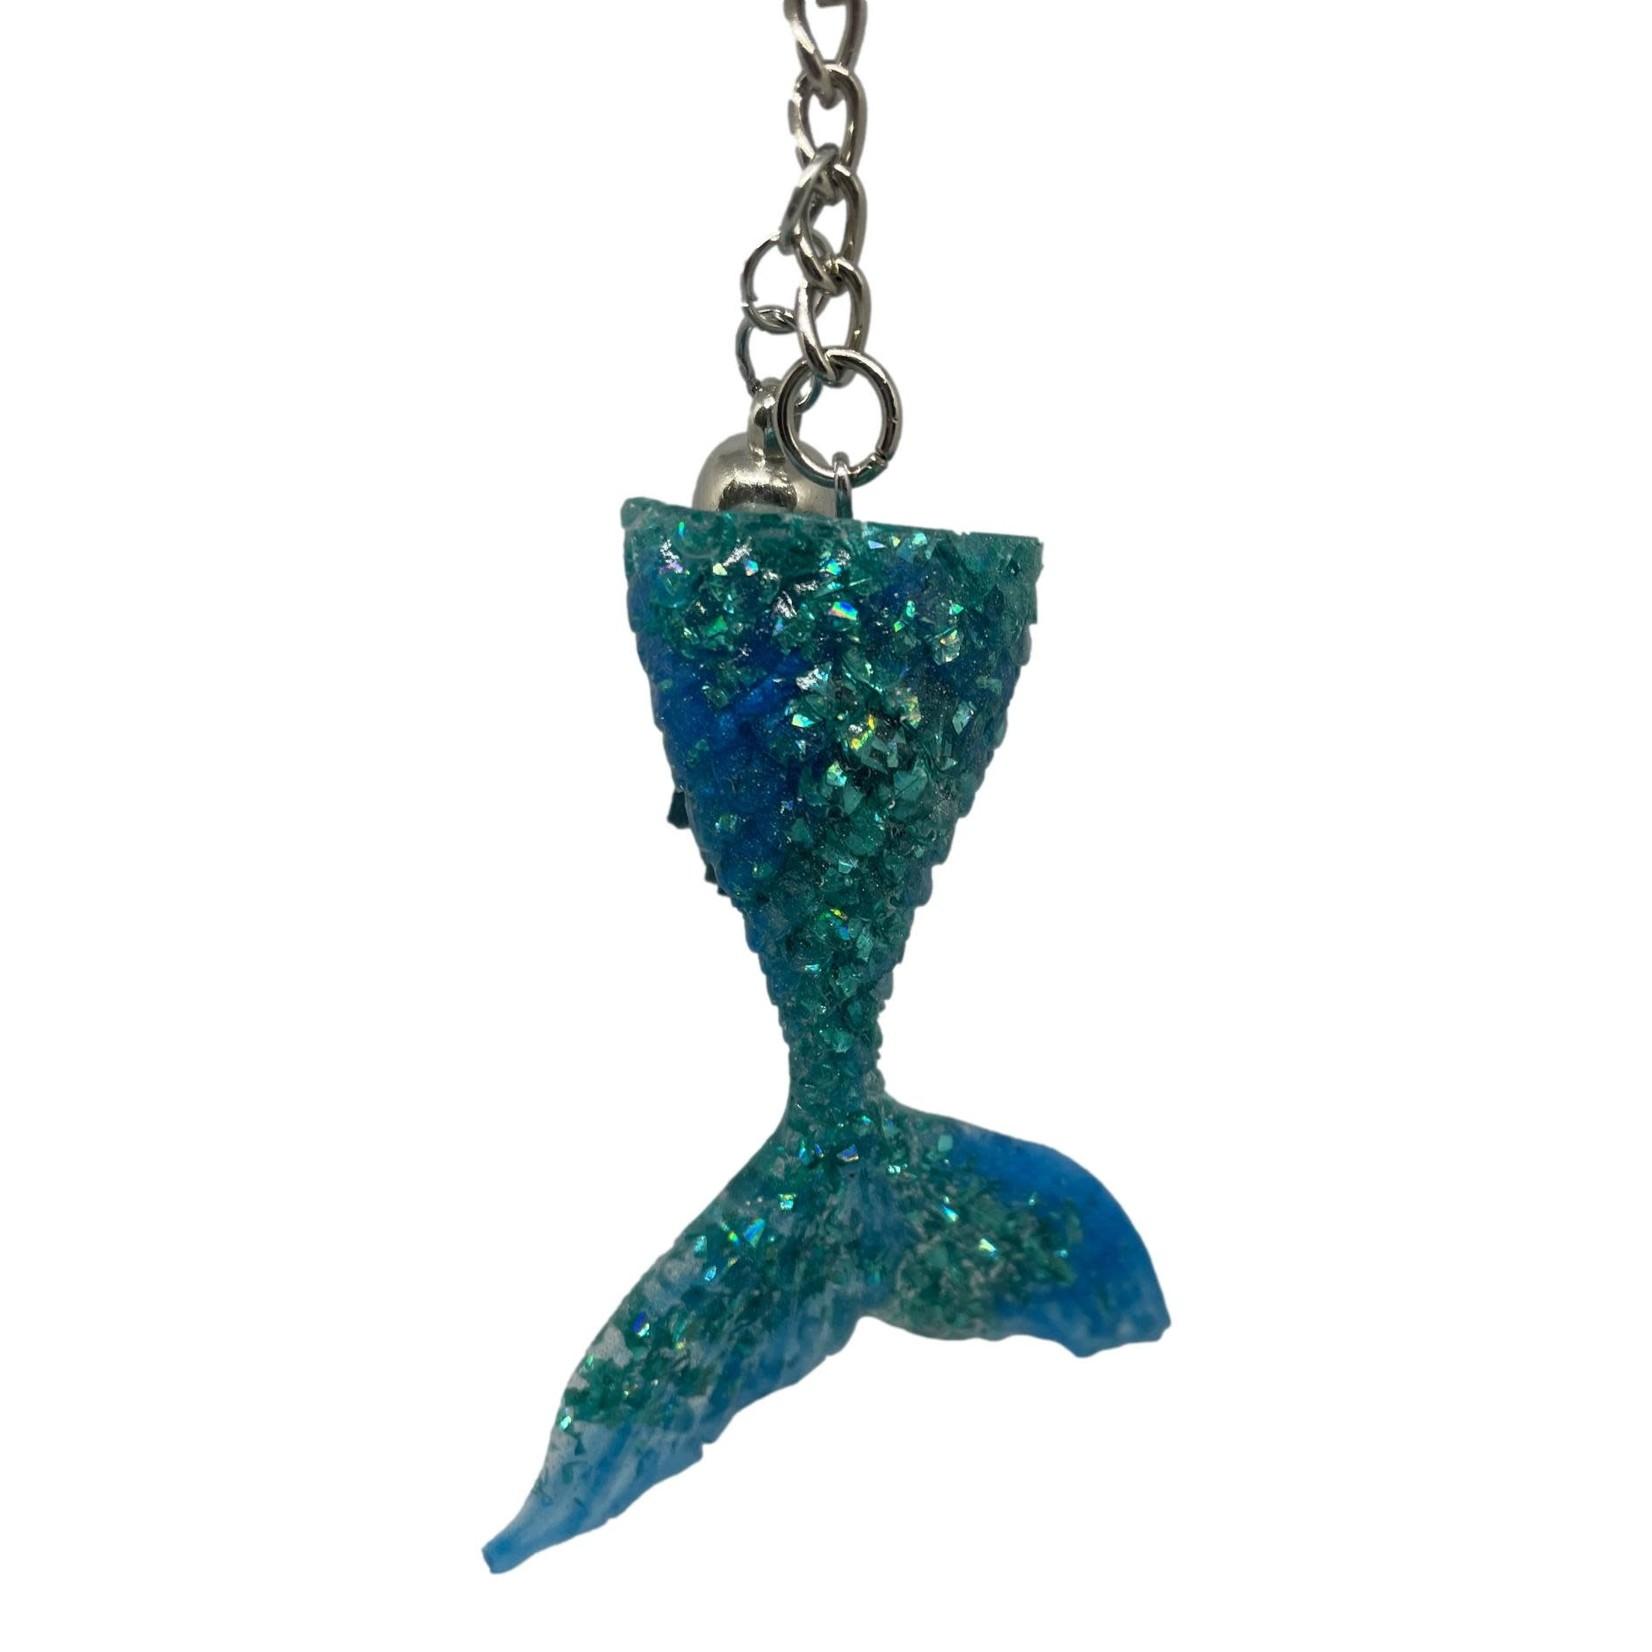 East Coast Sirens Mermaid Glitter Mermaid Tail Key Chain